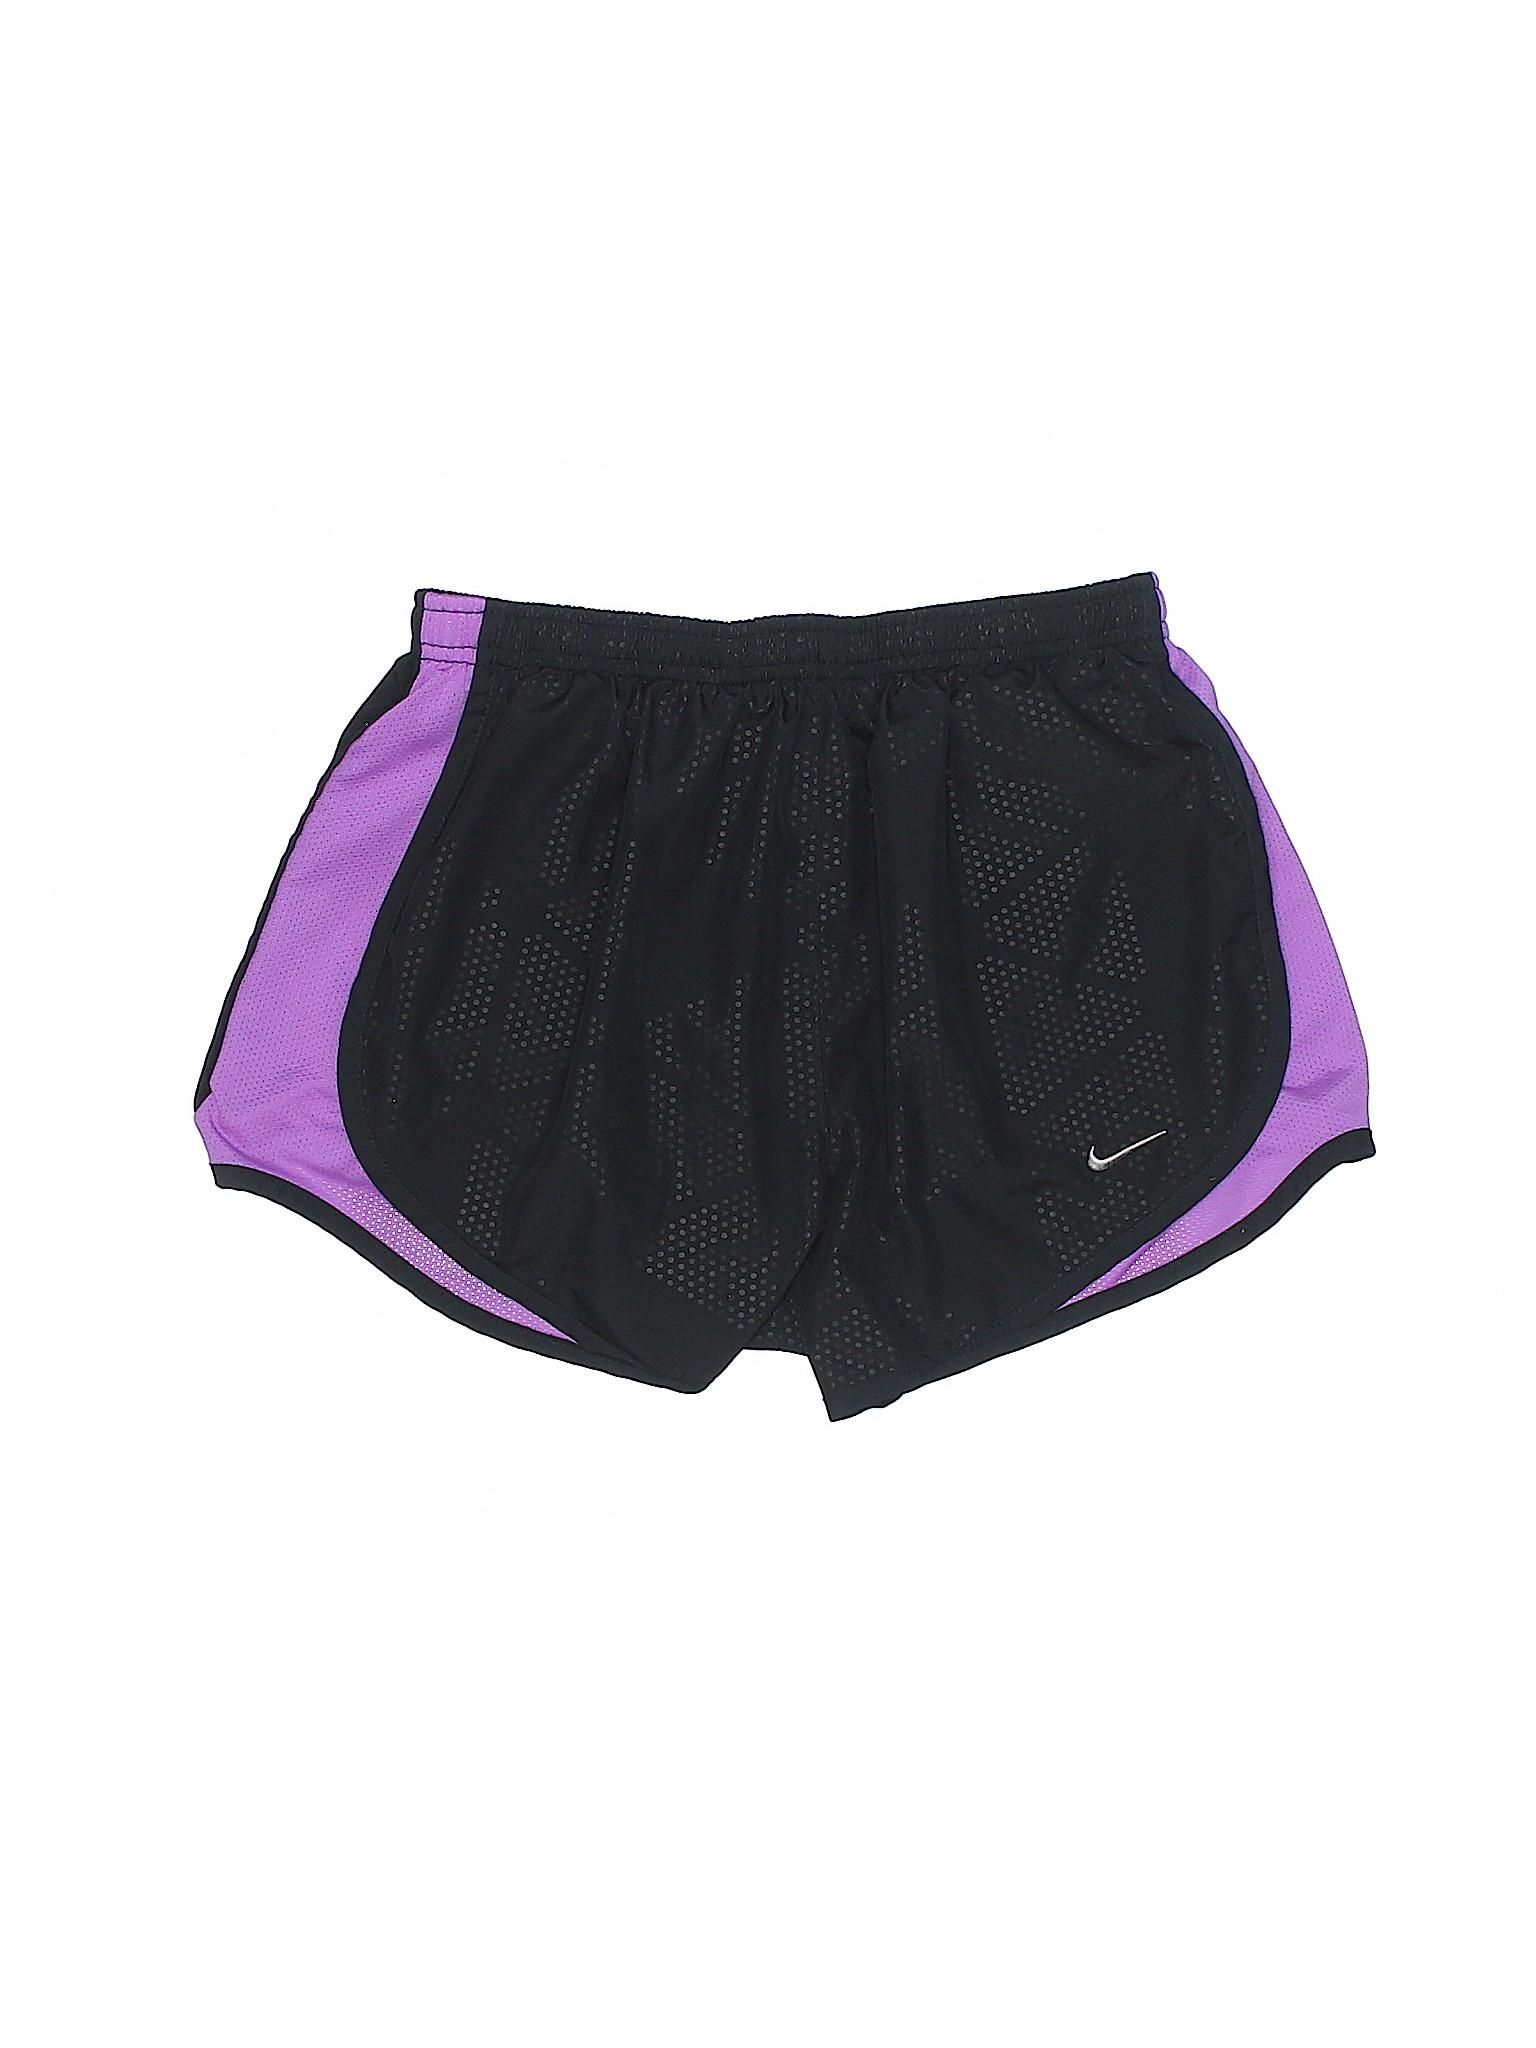 Nike Boutique Nike Boutique Shorts Athletic Boutique Nike Shorts Athletic Athletic Nike Shorts Athletic Boutique wHAqYA